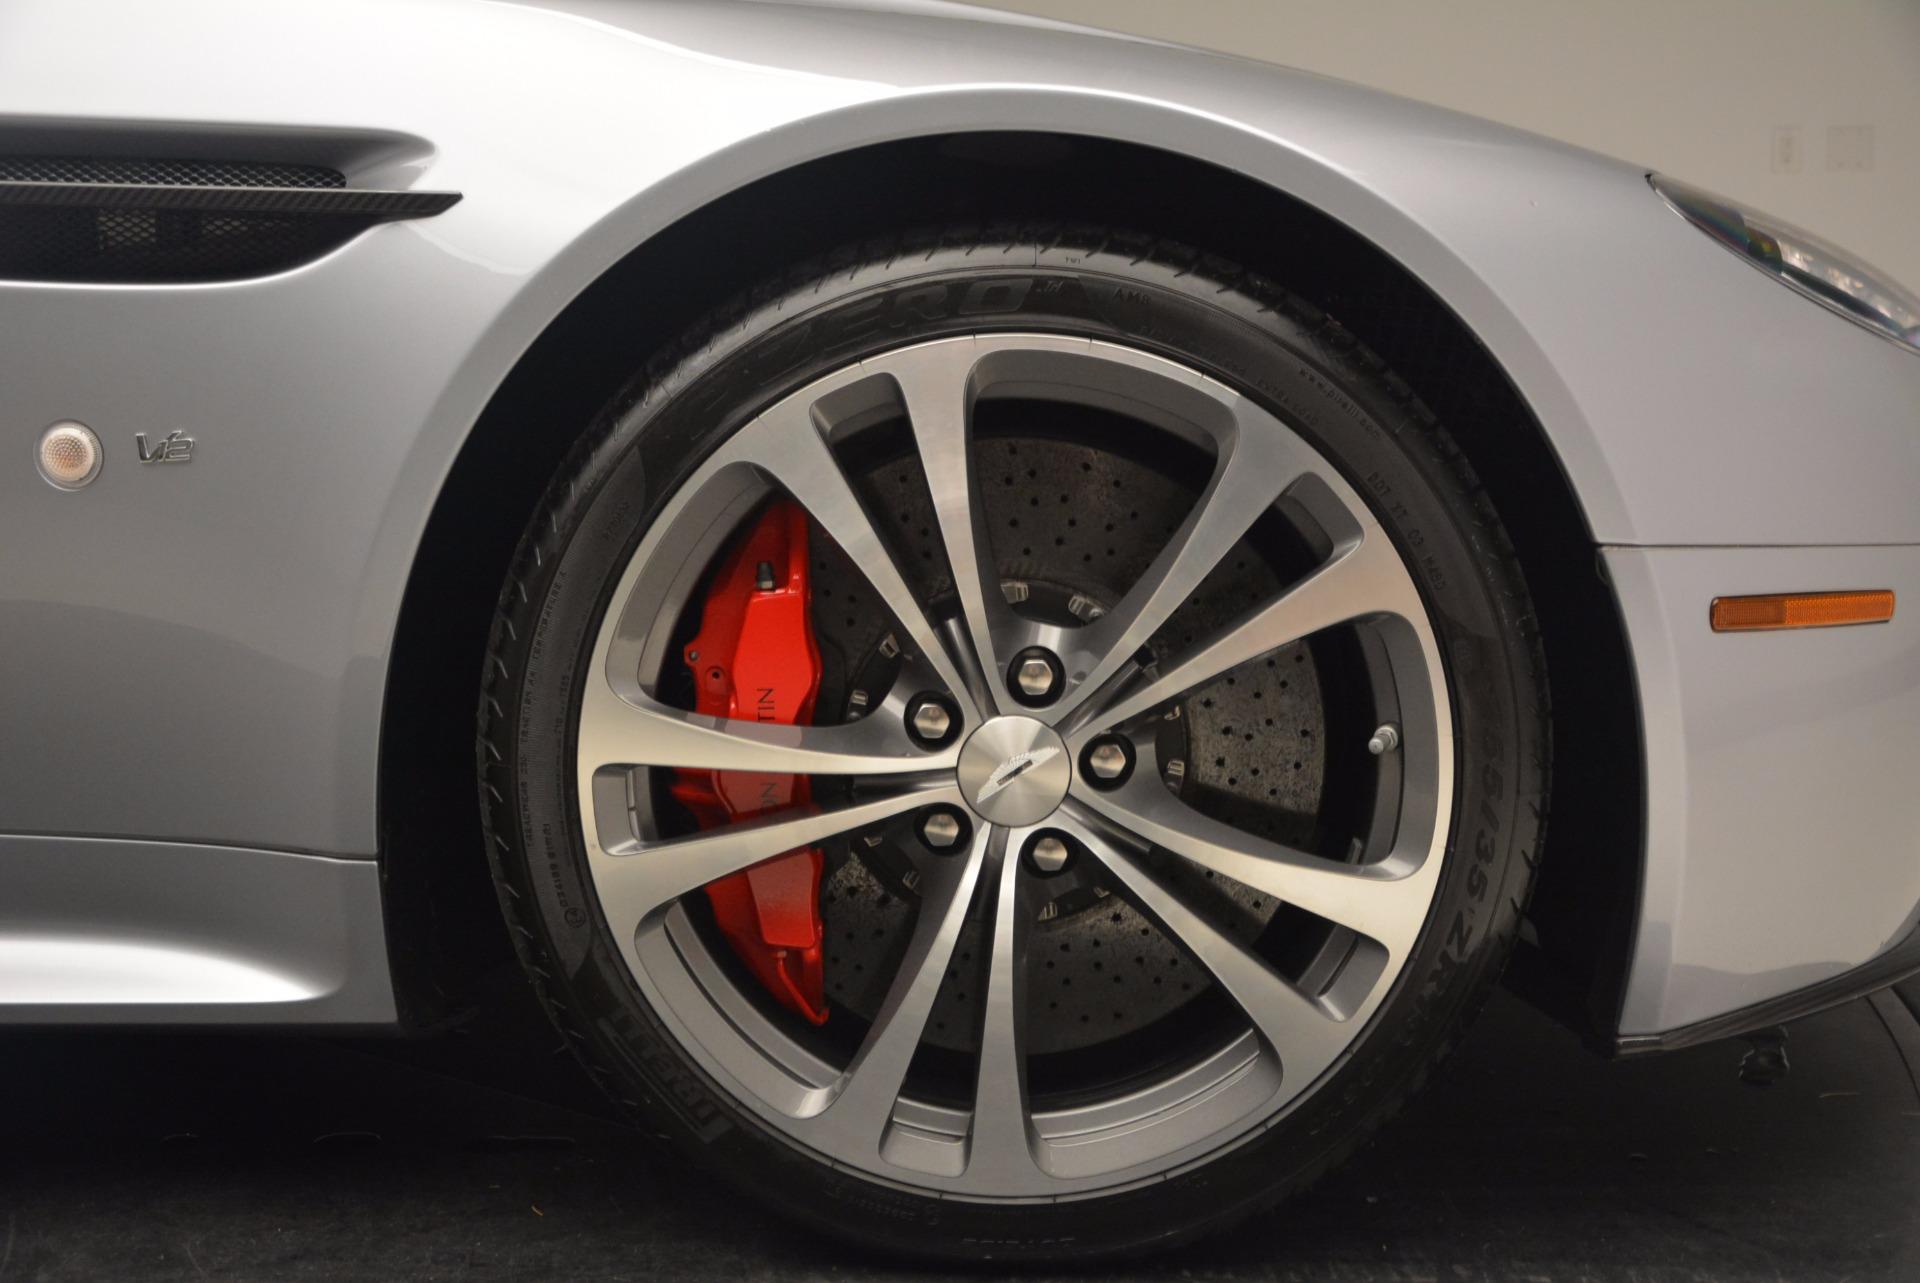 Used 2015 Aston Martin V12 Vantage S Roadster For Sale In Westport, CT 1130_p29